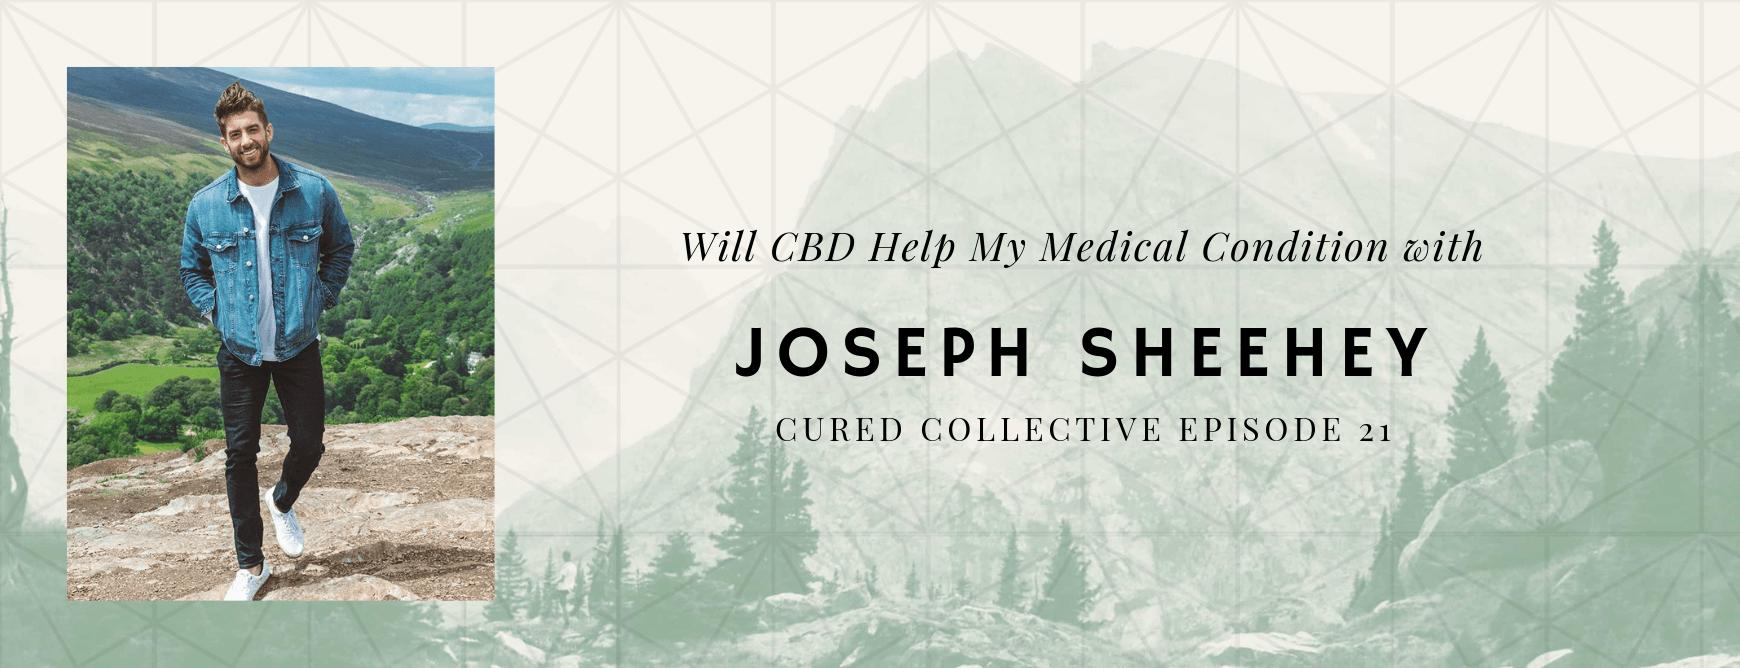 Will CBD Help My Medical Condition